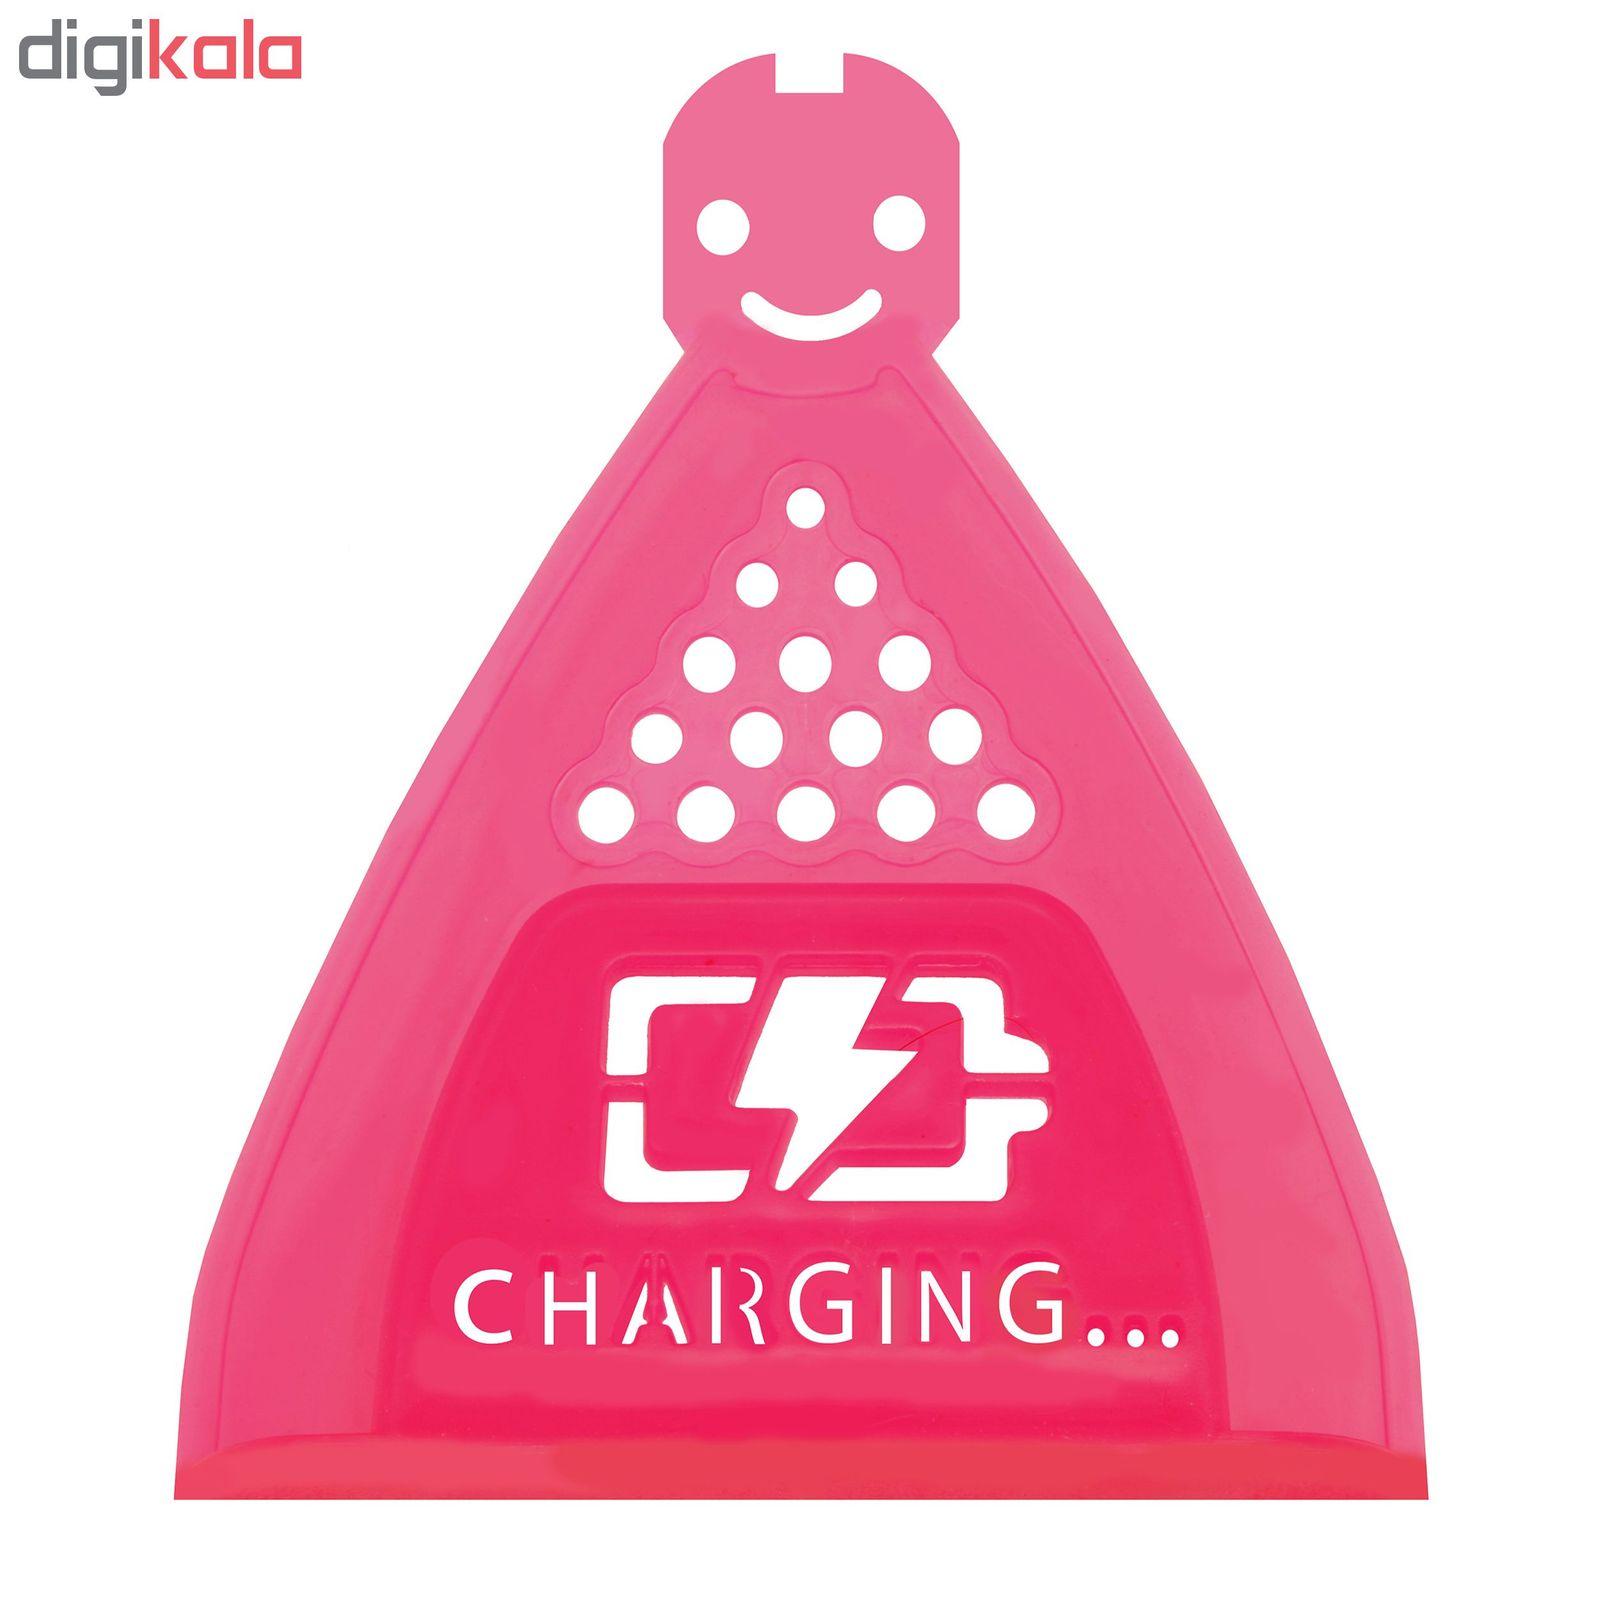 پایه نگهدارنده شارژر موبایل مدل Hng 0229 main 1 6